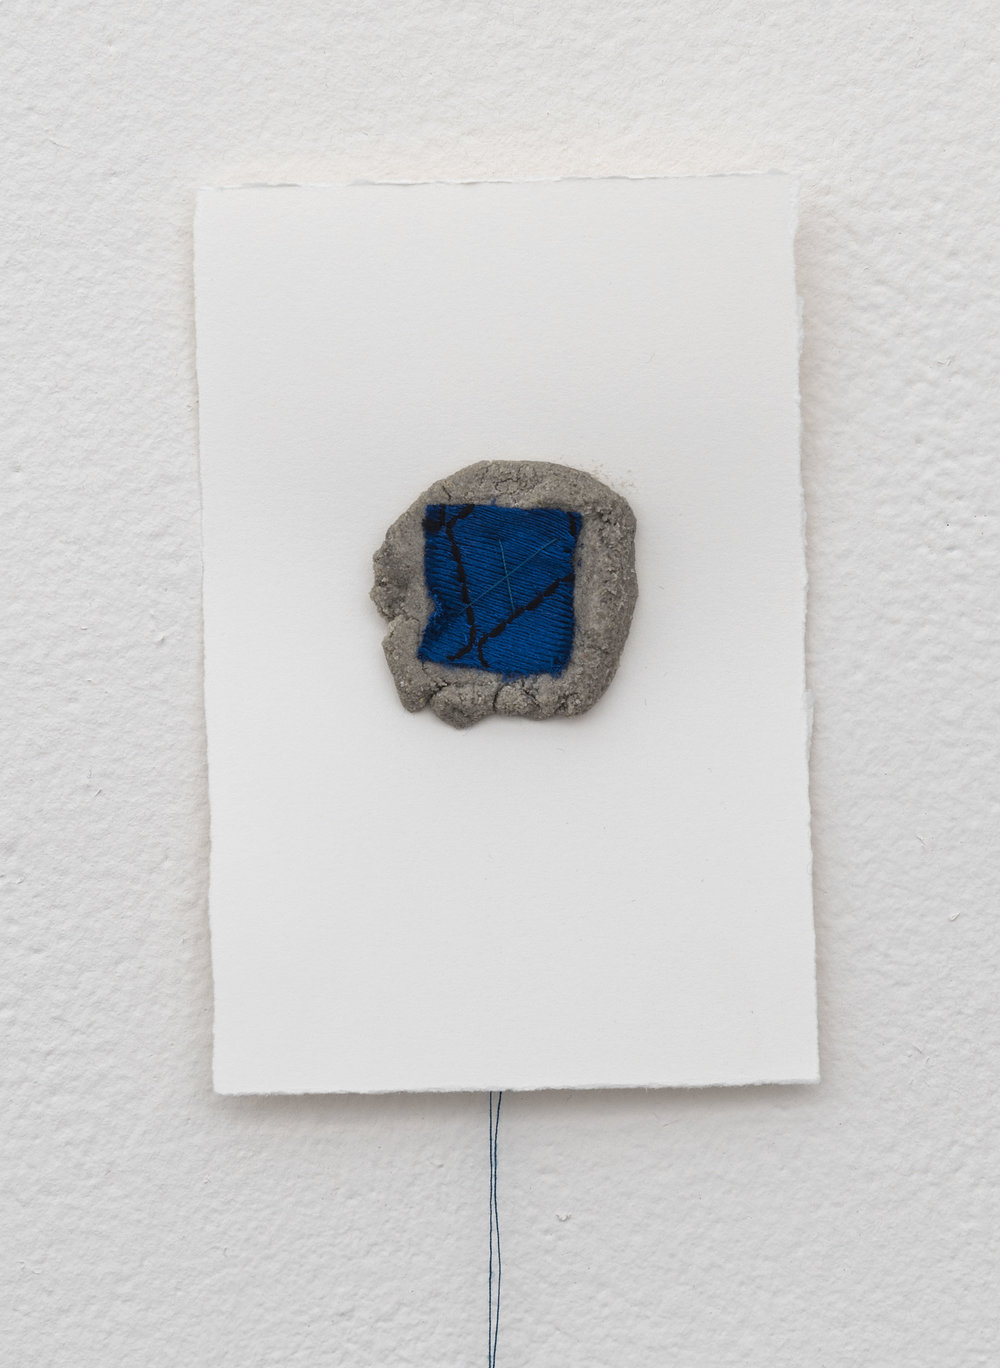 Blue Square, 2018